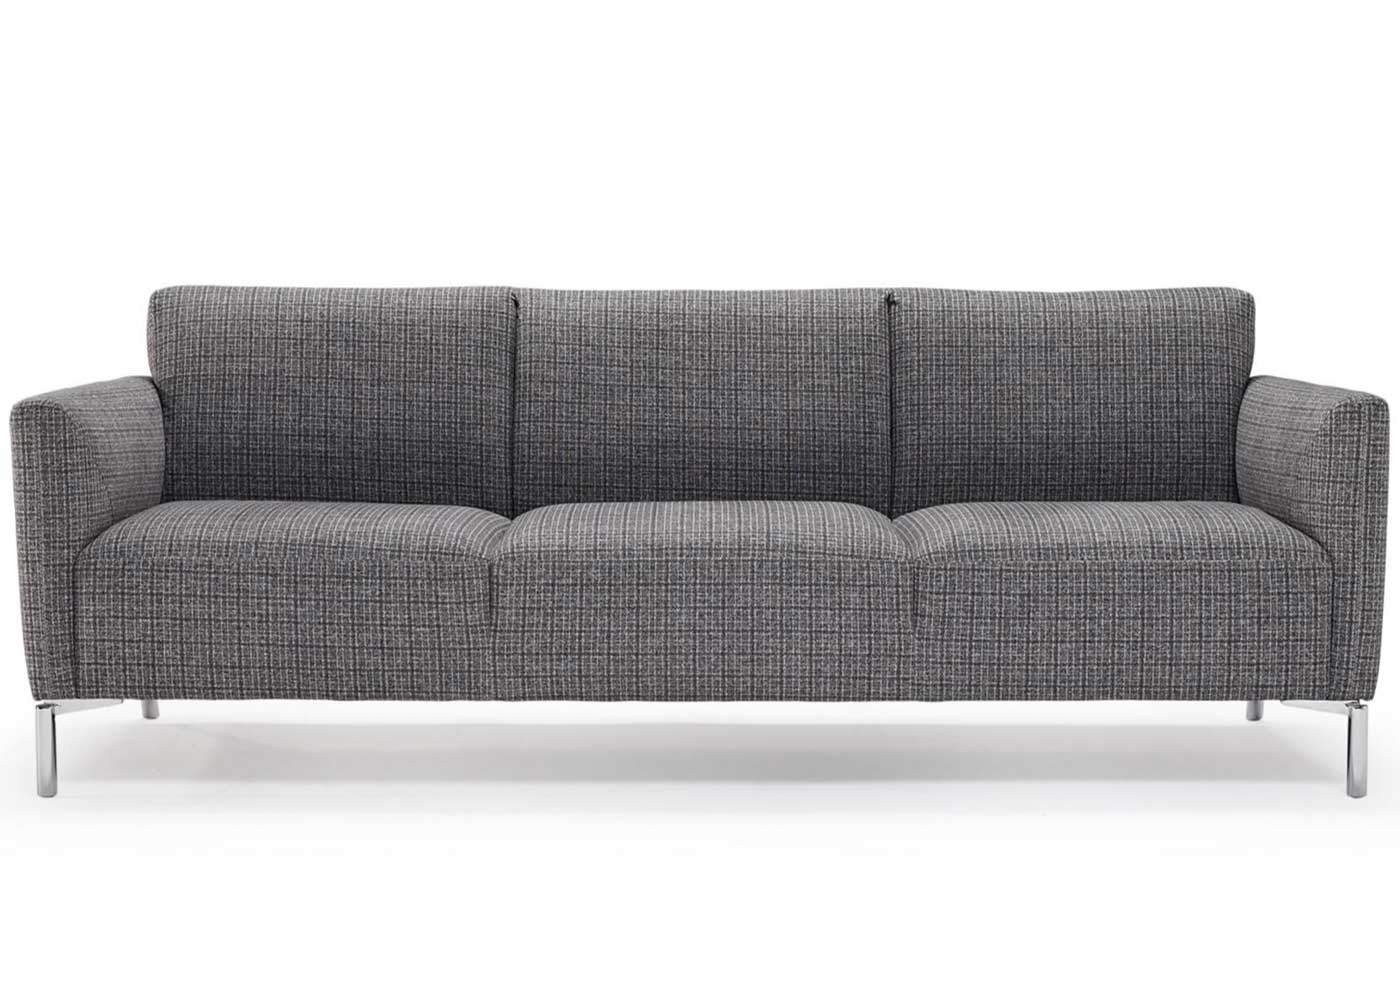 natuzzi sofa bed clearance twin sleeper walmart italia tratto midfurn furniture superstore